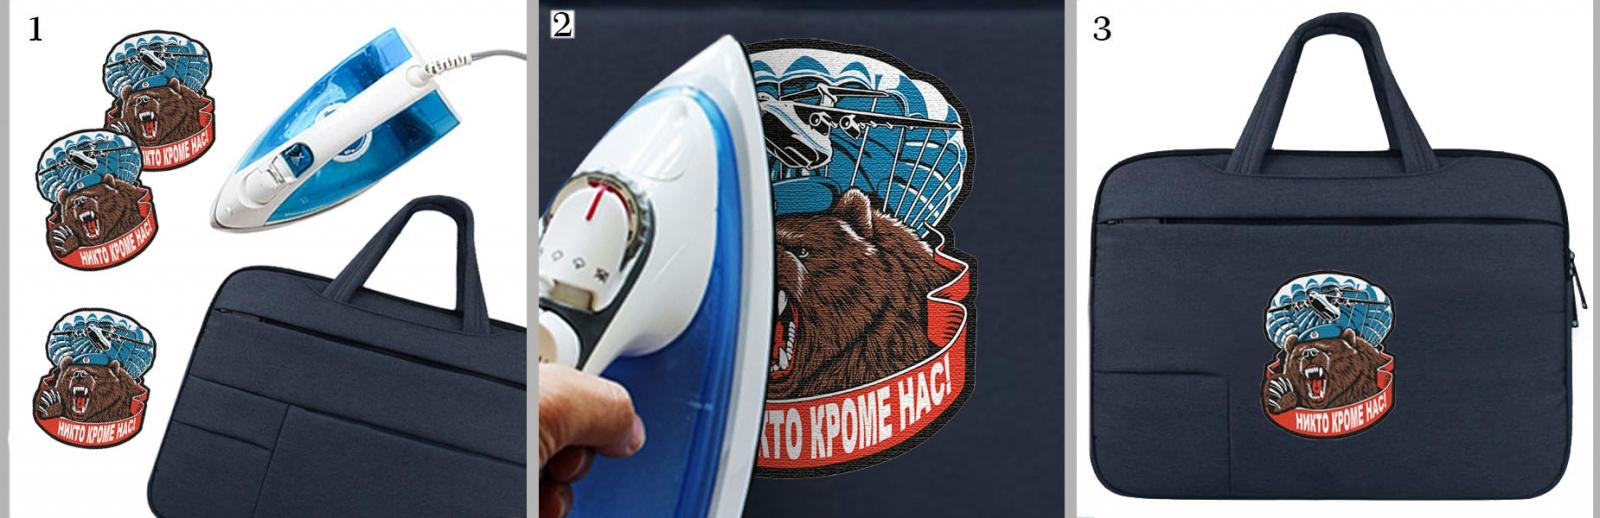 "Нашивка ""Медведь в берете ВДВ"" на сумке"